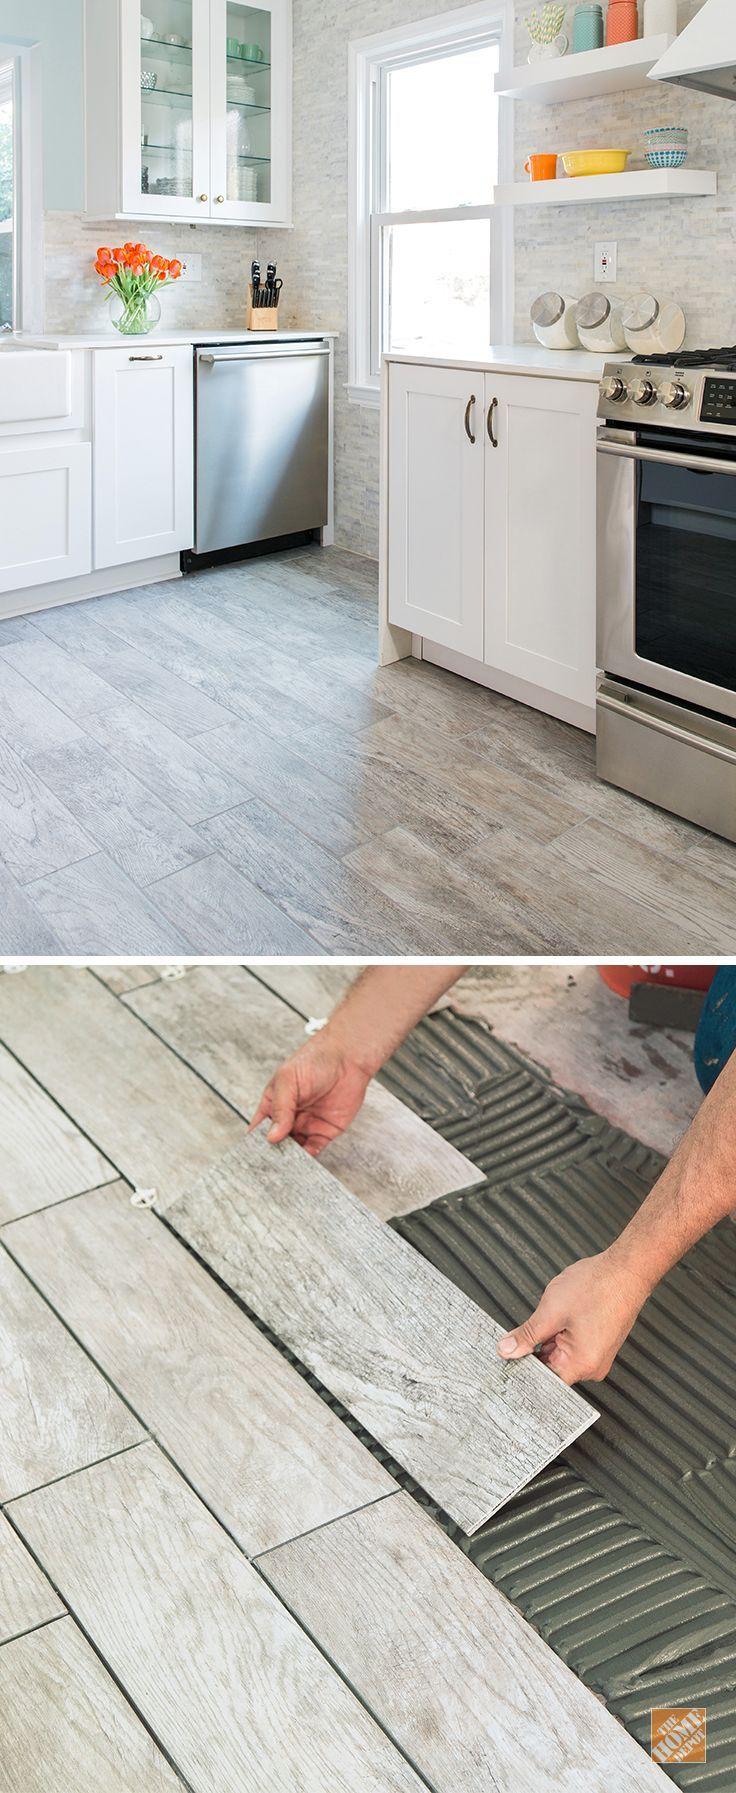 Marazzi kitchen floors porcelain and choices marazzi wood look tile dailygadgetfo Images